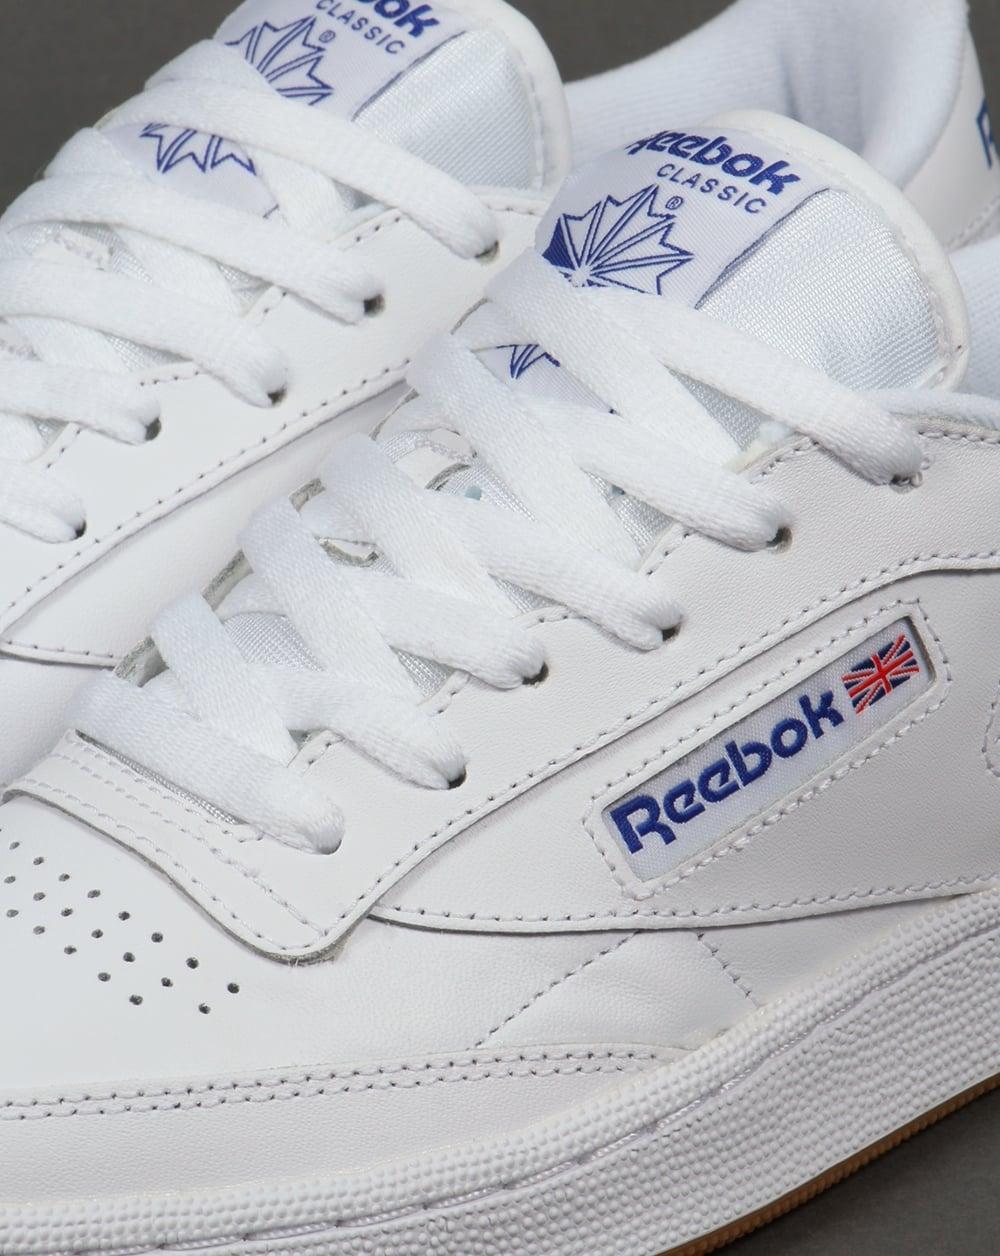 fa678be32aa9 Reebok Club C 85 Trainers White Royal Gum